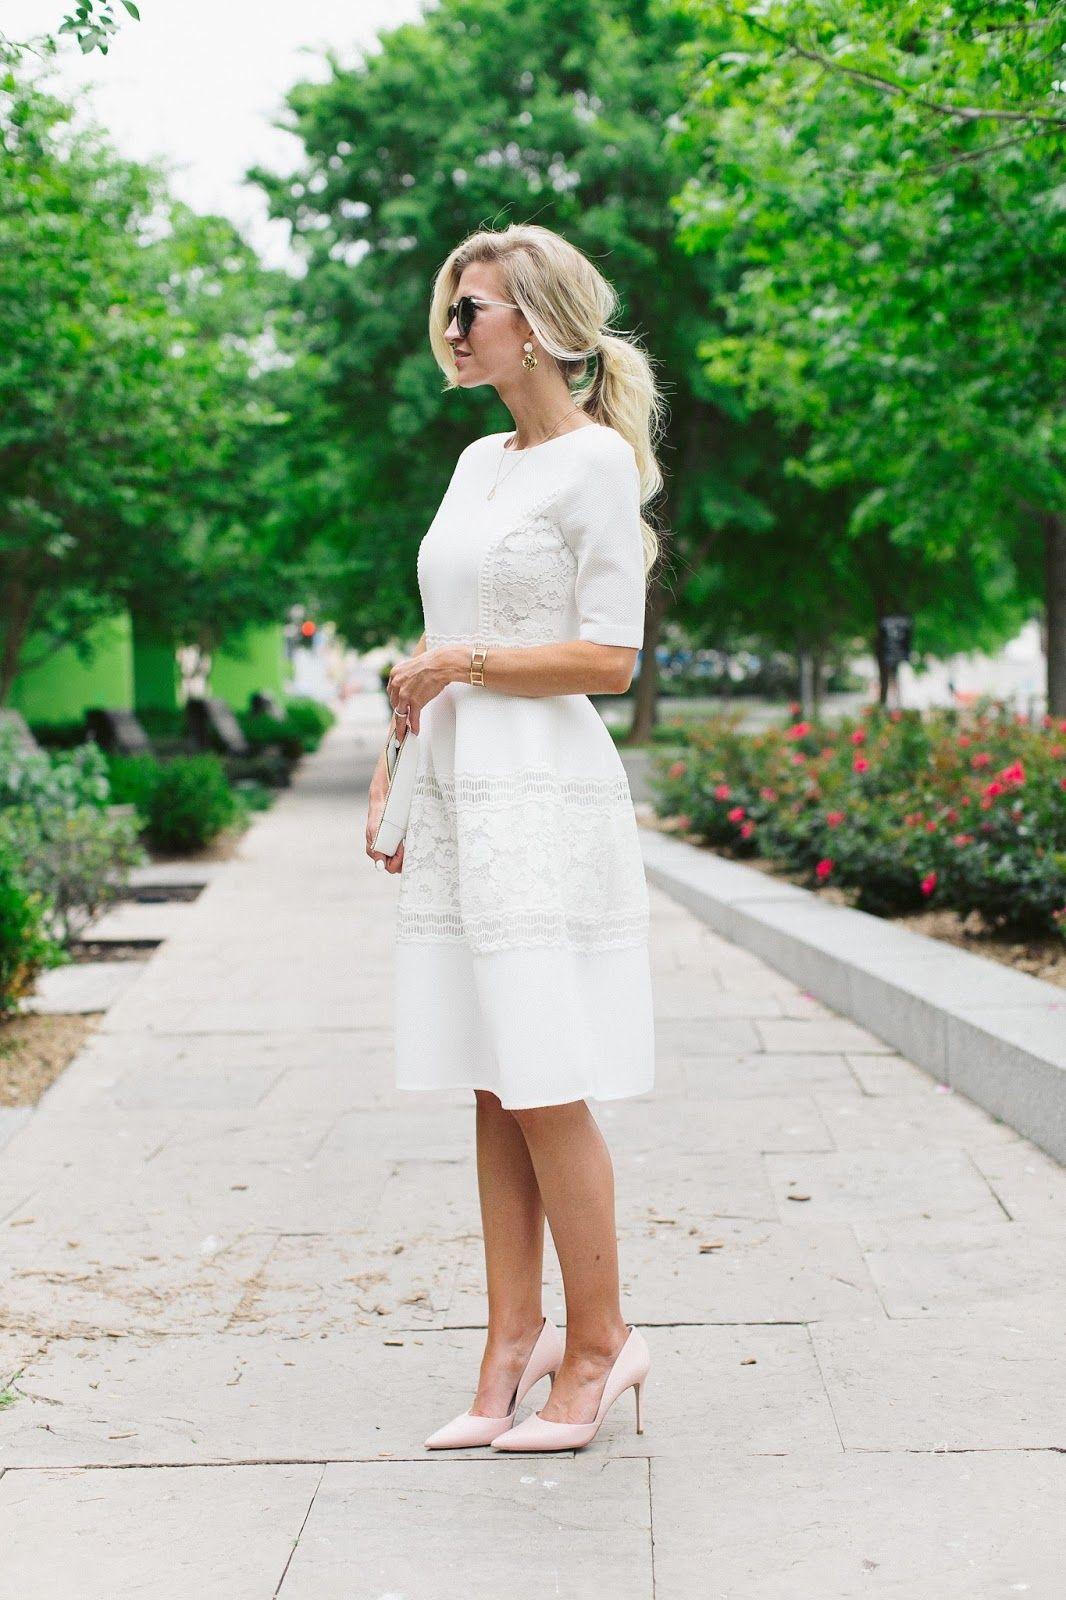 weißes kurzes kleid engagement fotos | Dream Weddings | Pinterest ...